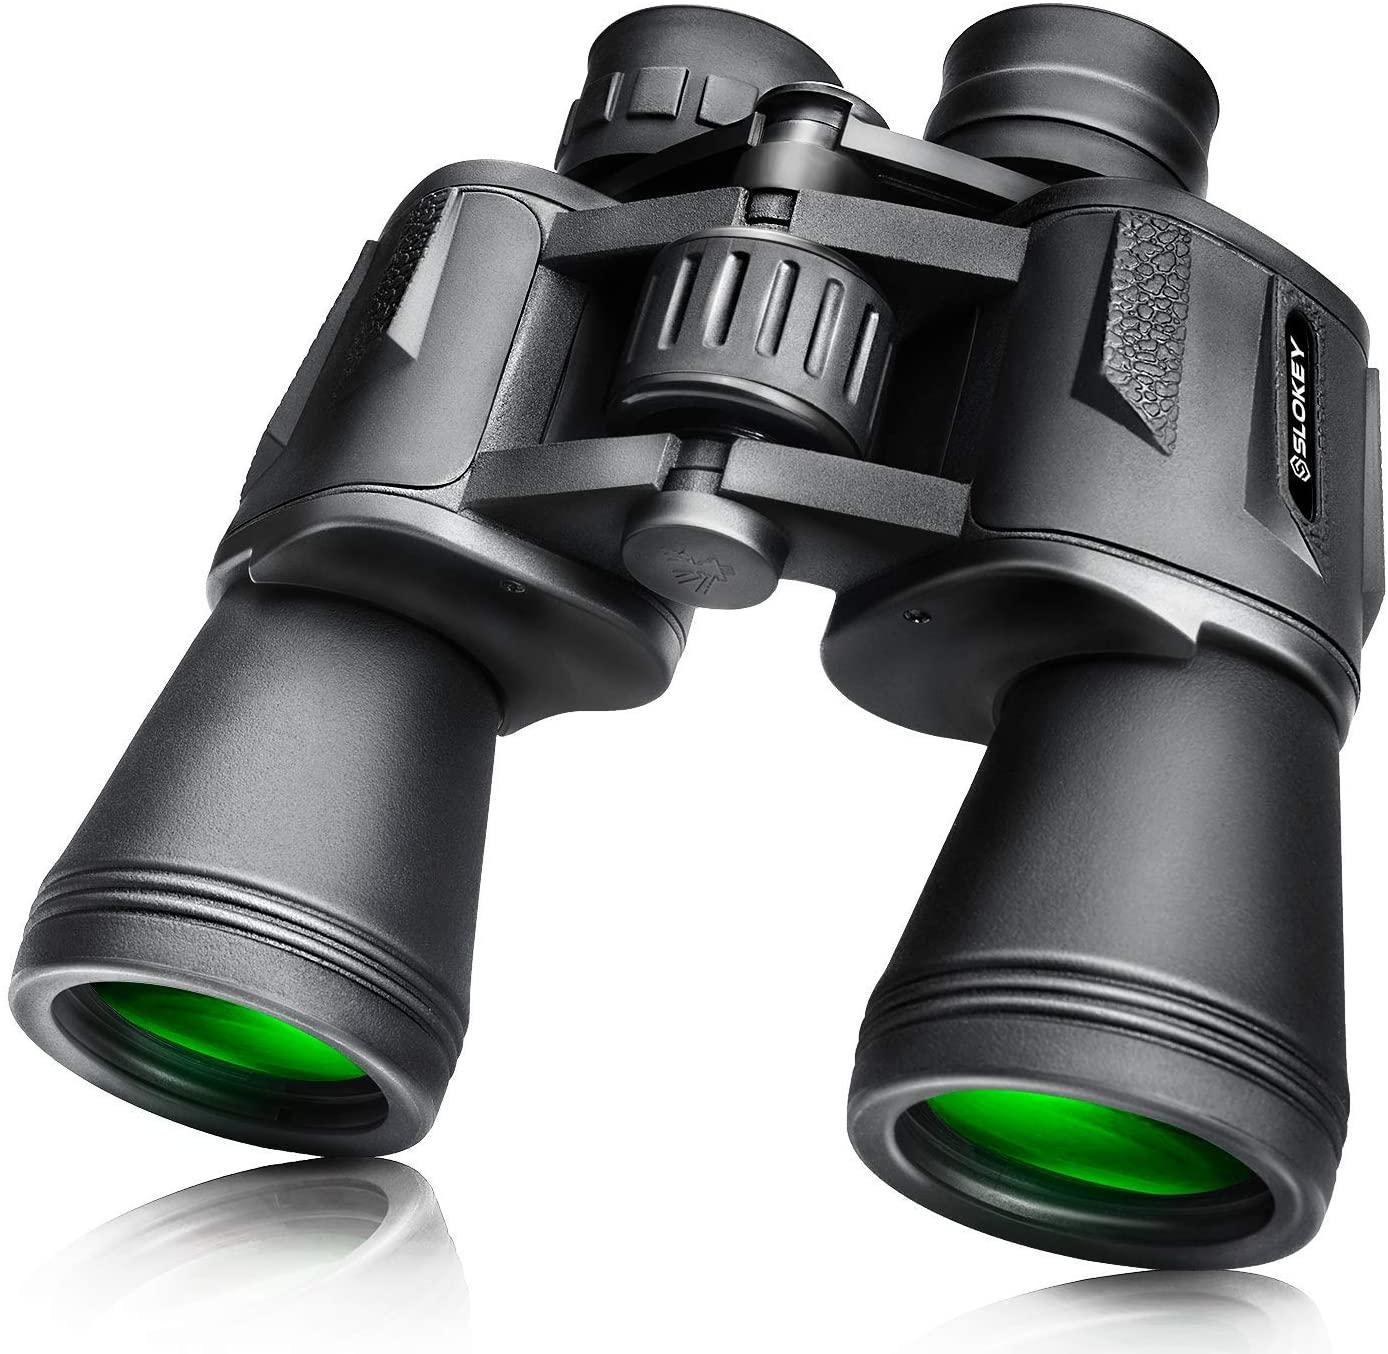 prismaticos-de-largo-alcance-slokey-gr1050.jpg